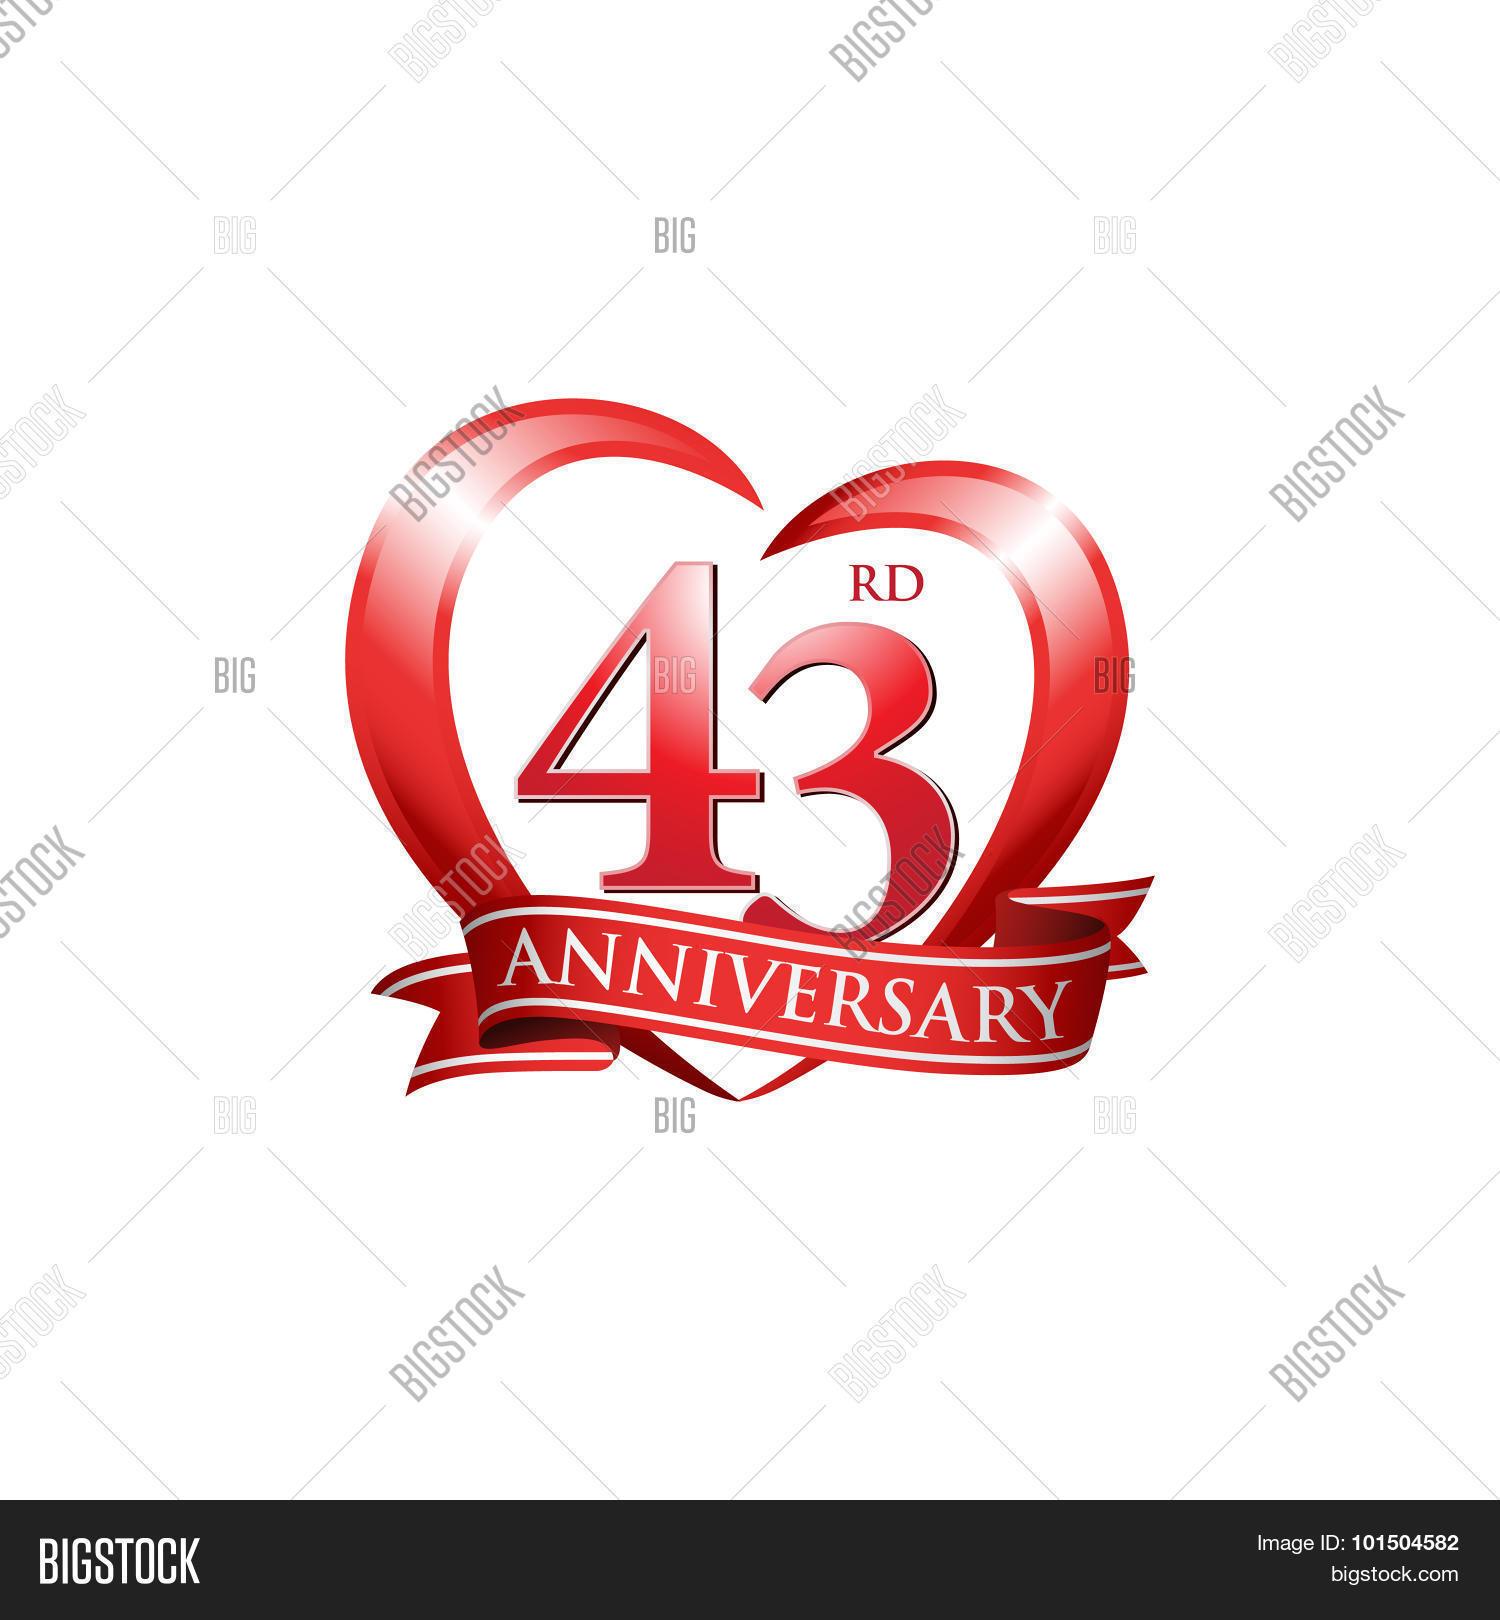 43rd Anniversary Logo Vector Photo Free Trial Bigstock